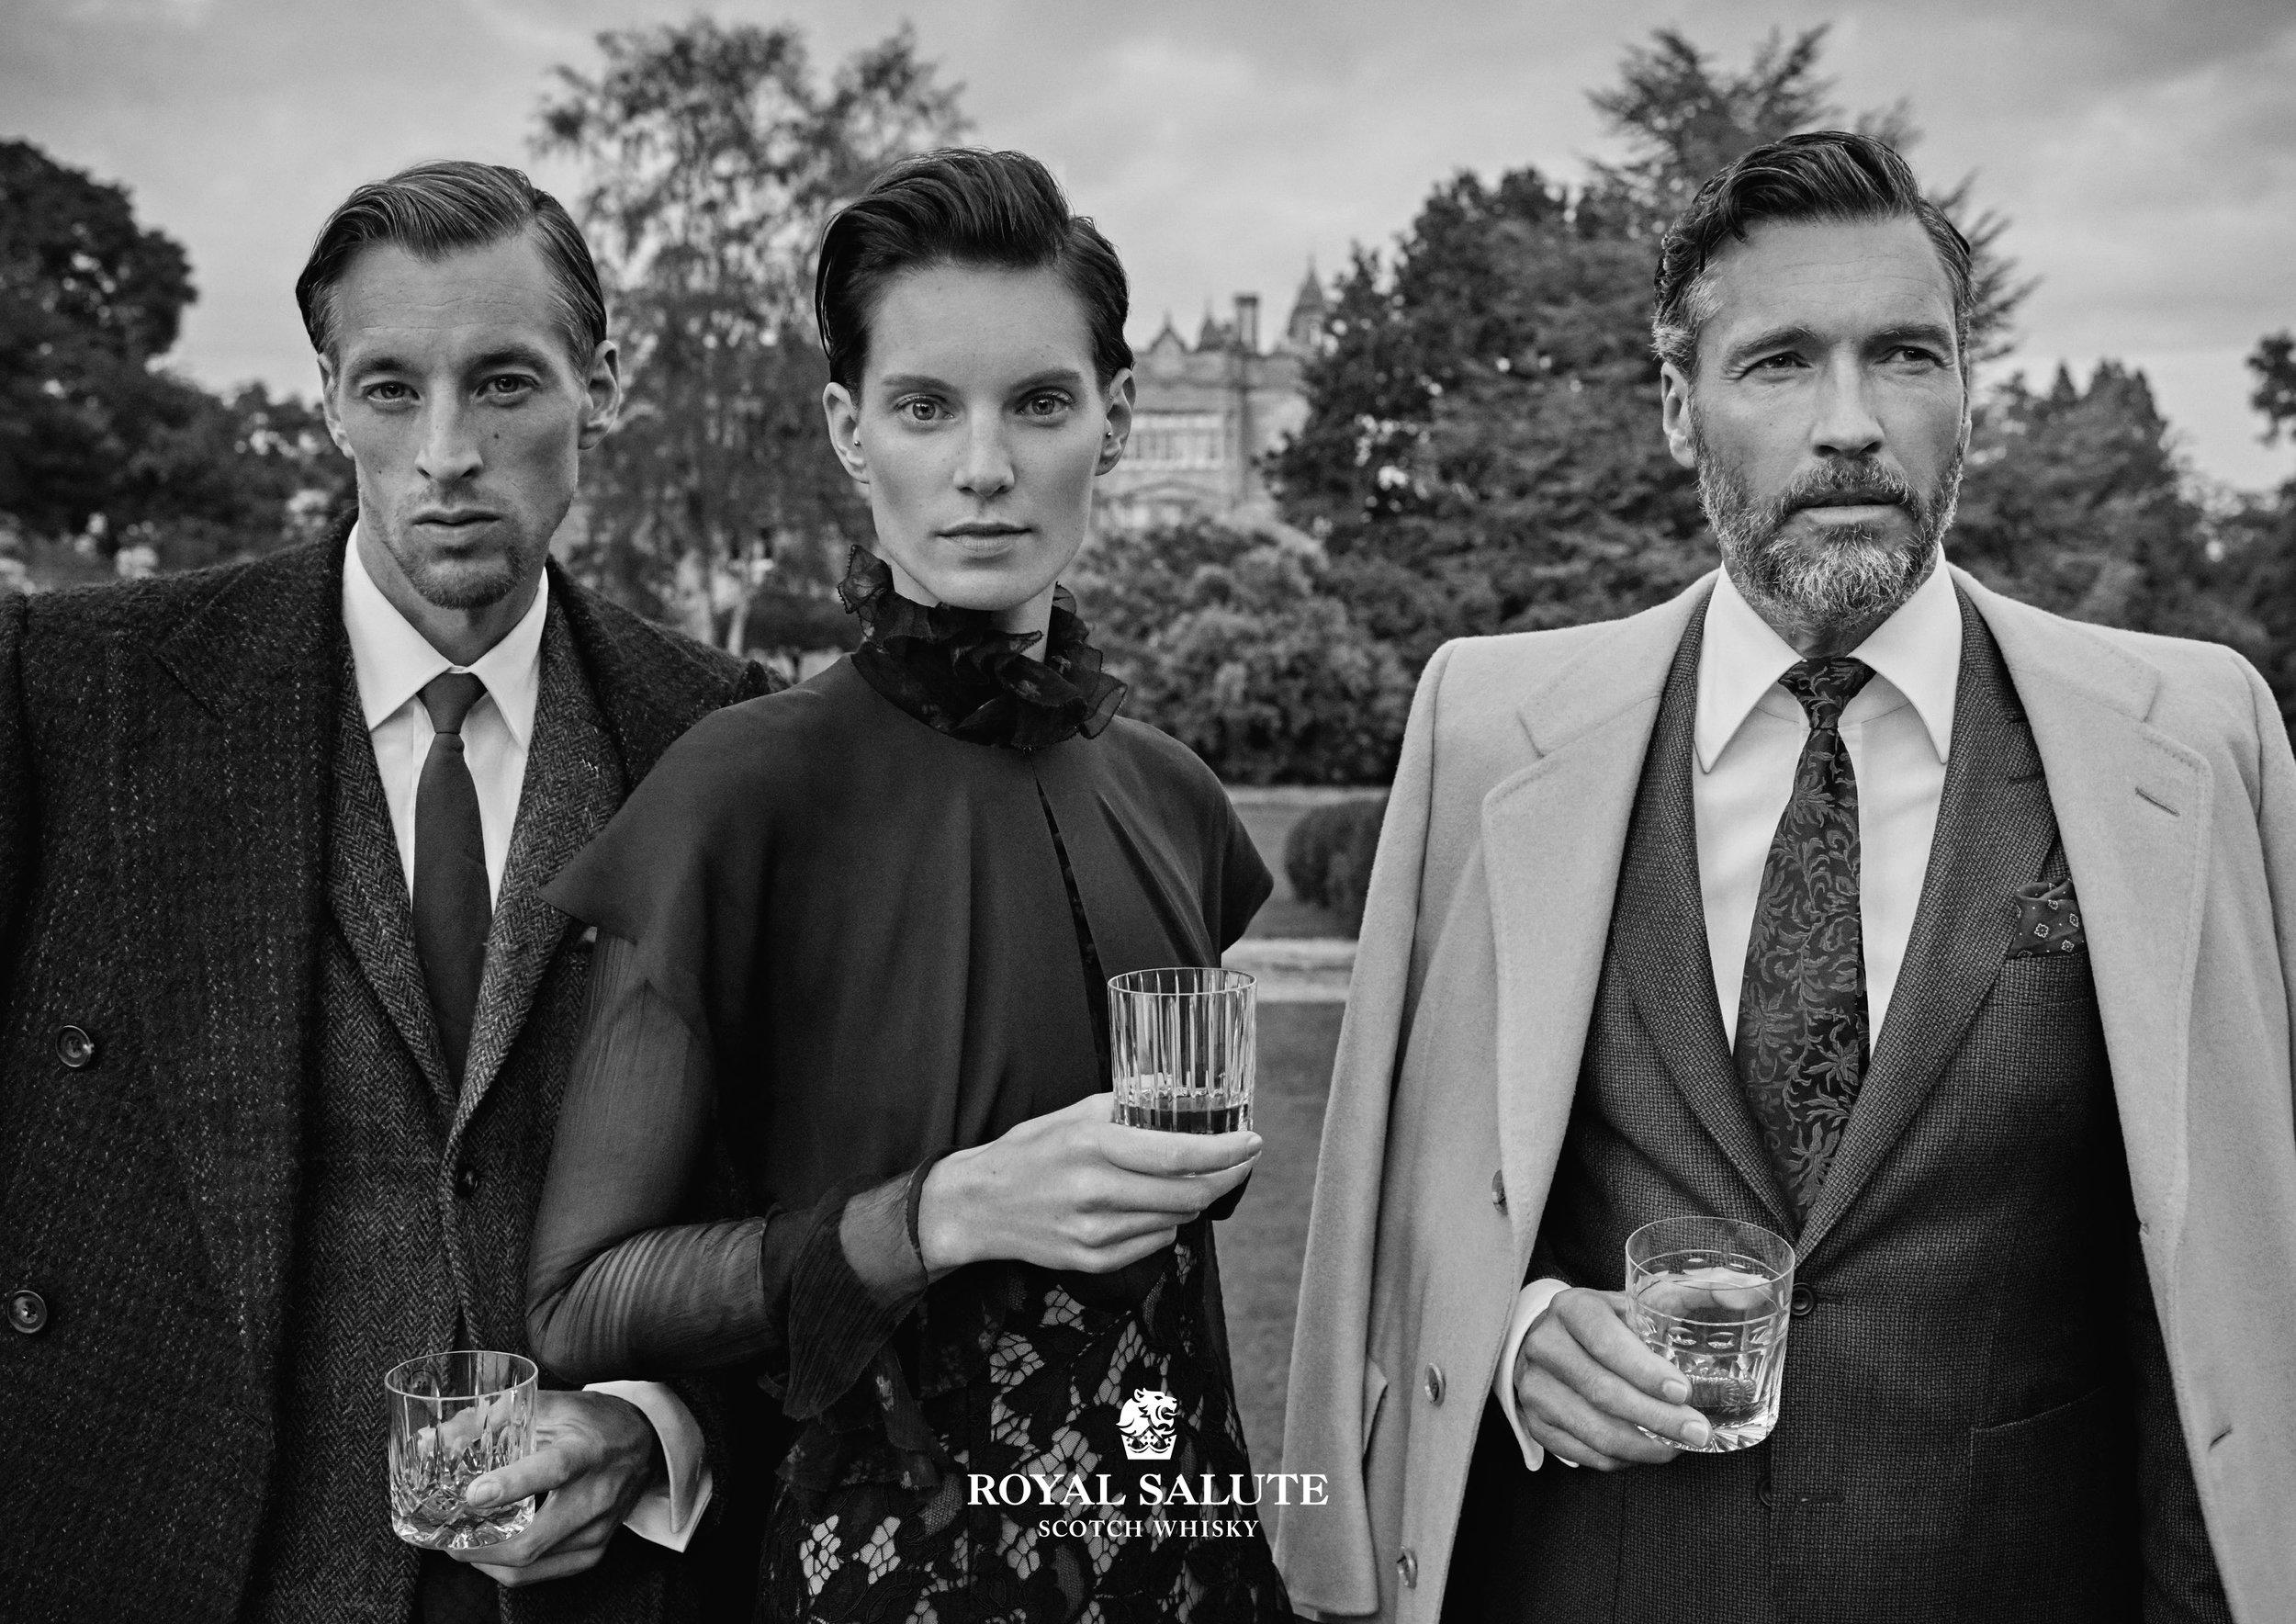 Royal-Salute-Bohemian-Aristocracy-All.jpg